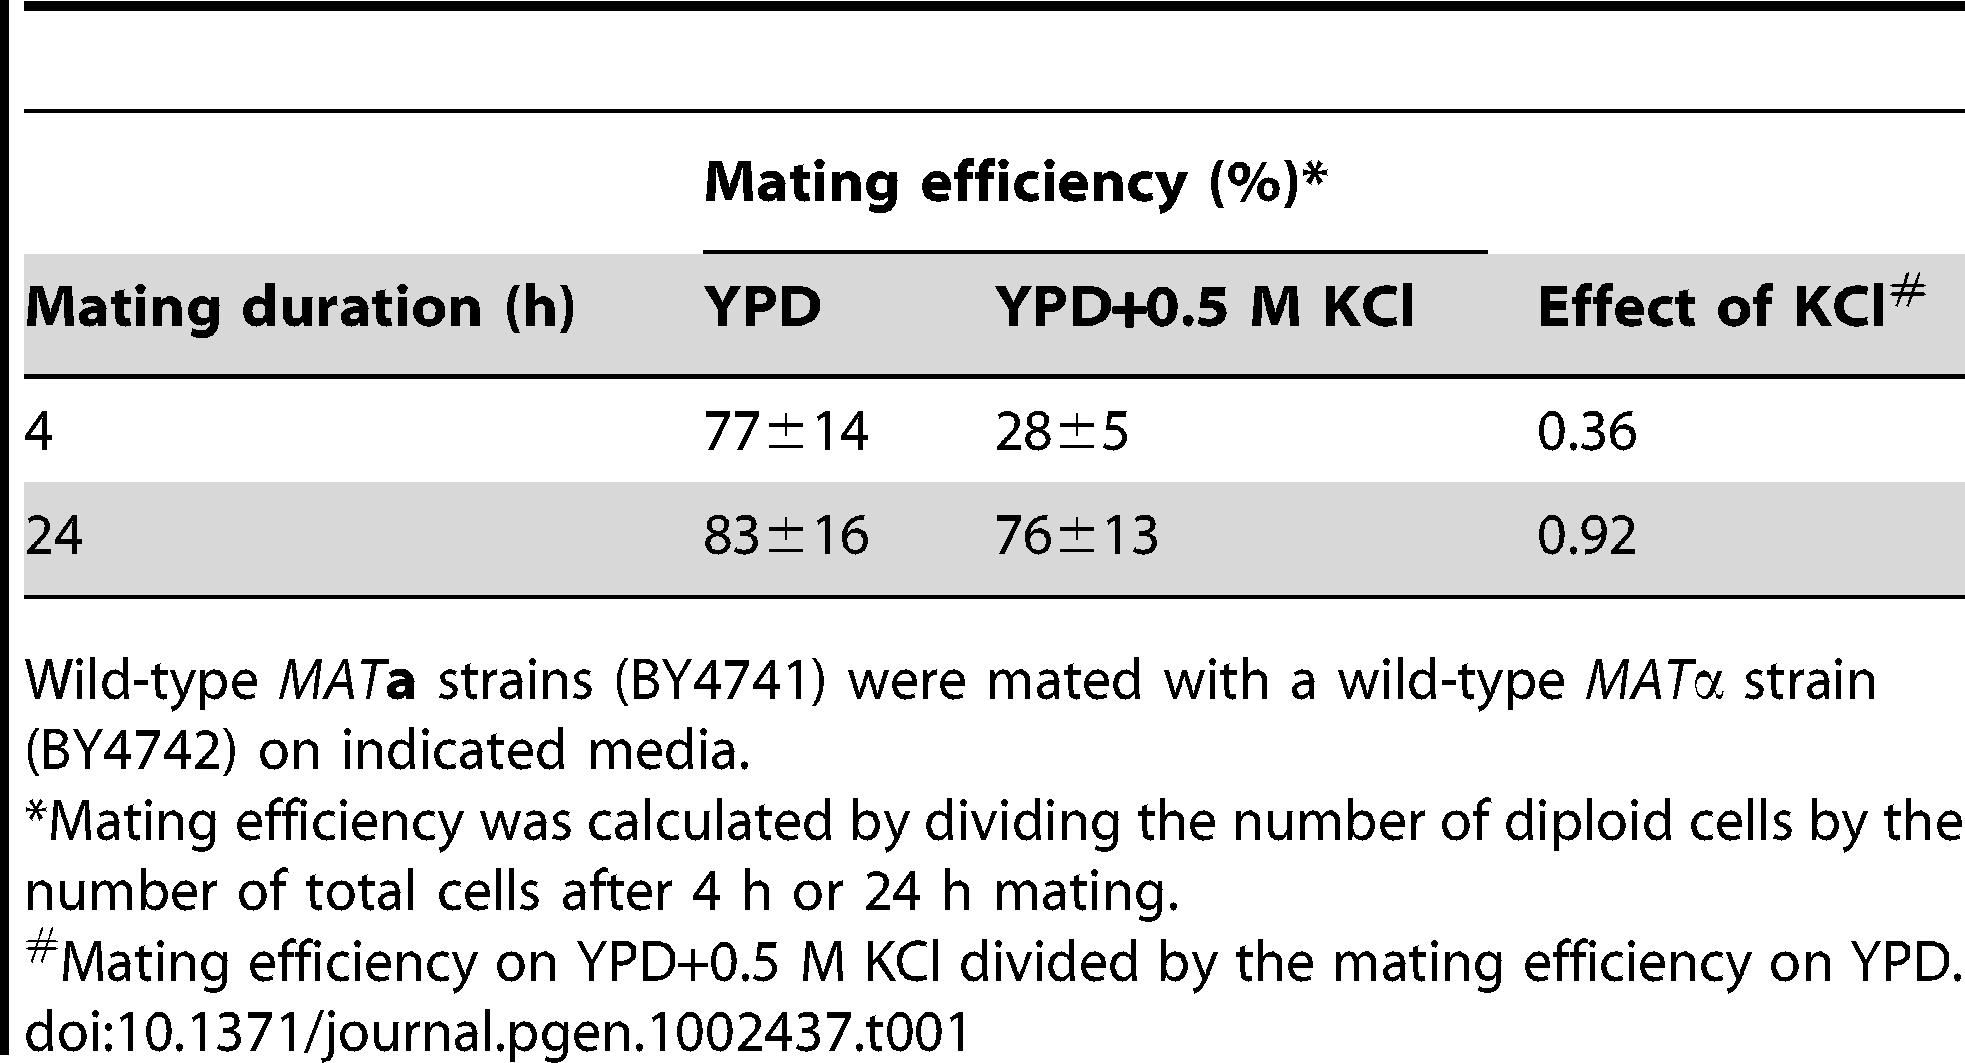 Hyperosmotic stress decreases mating efficiency.